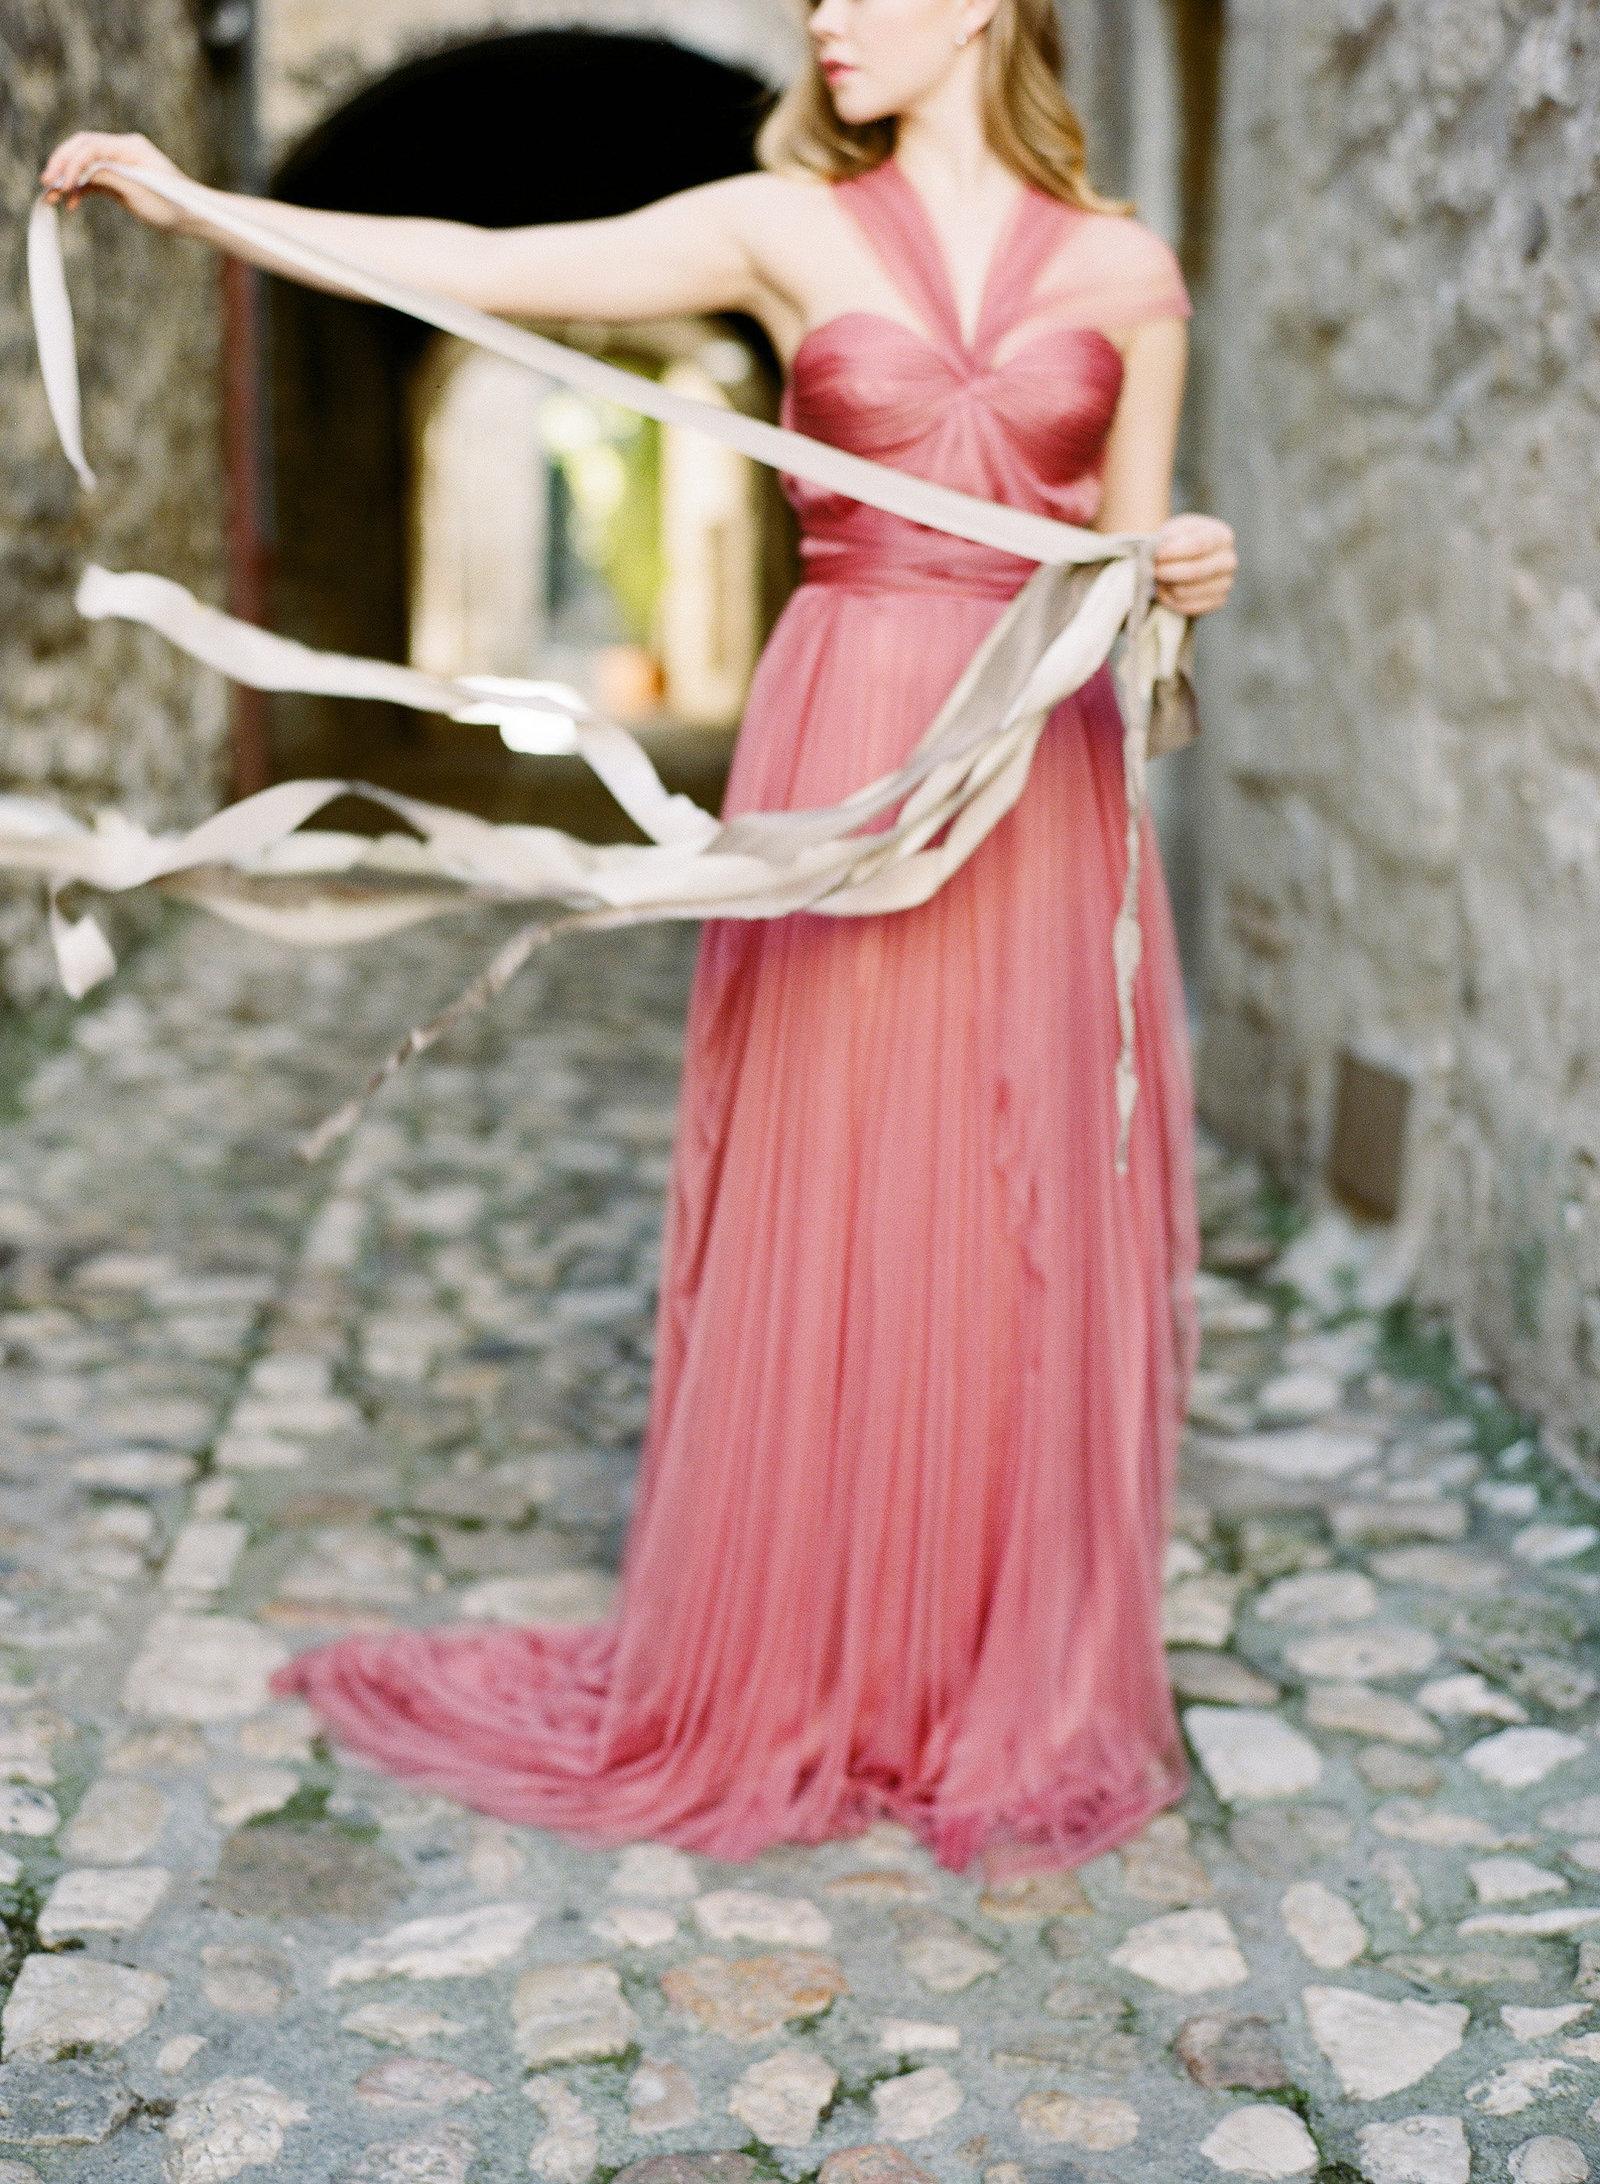 Calliope_pink_tulle_grecian_dress_JoanneFlemingDesign_LaurenDenisePhoto4